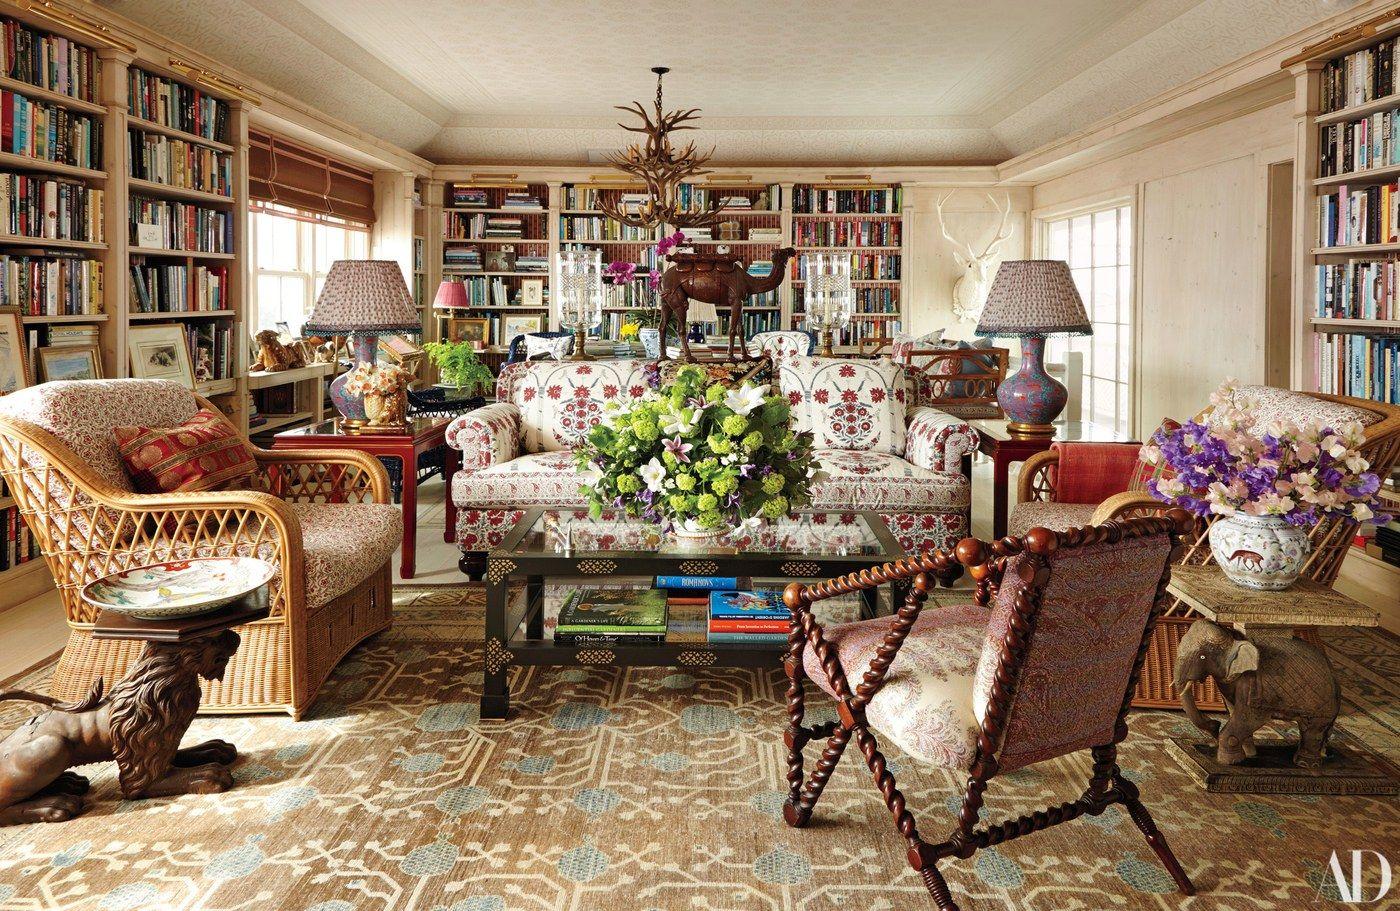 Bohemian Beauty via AD | Lovely Living Areas | Pinterest